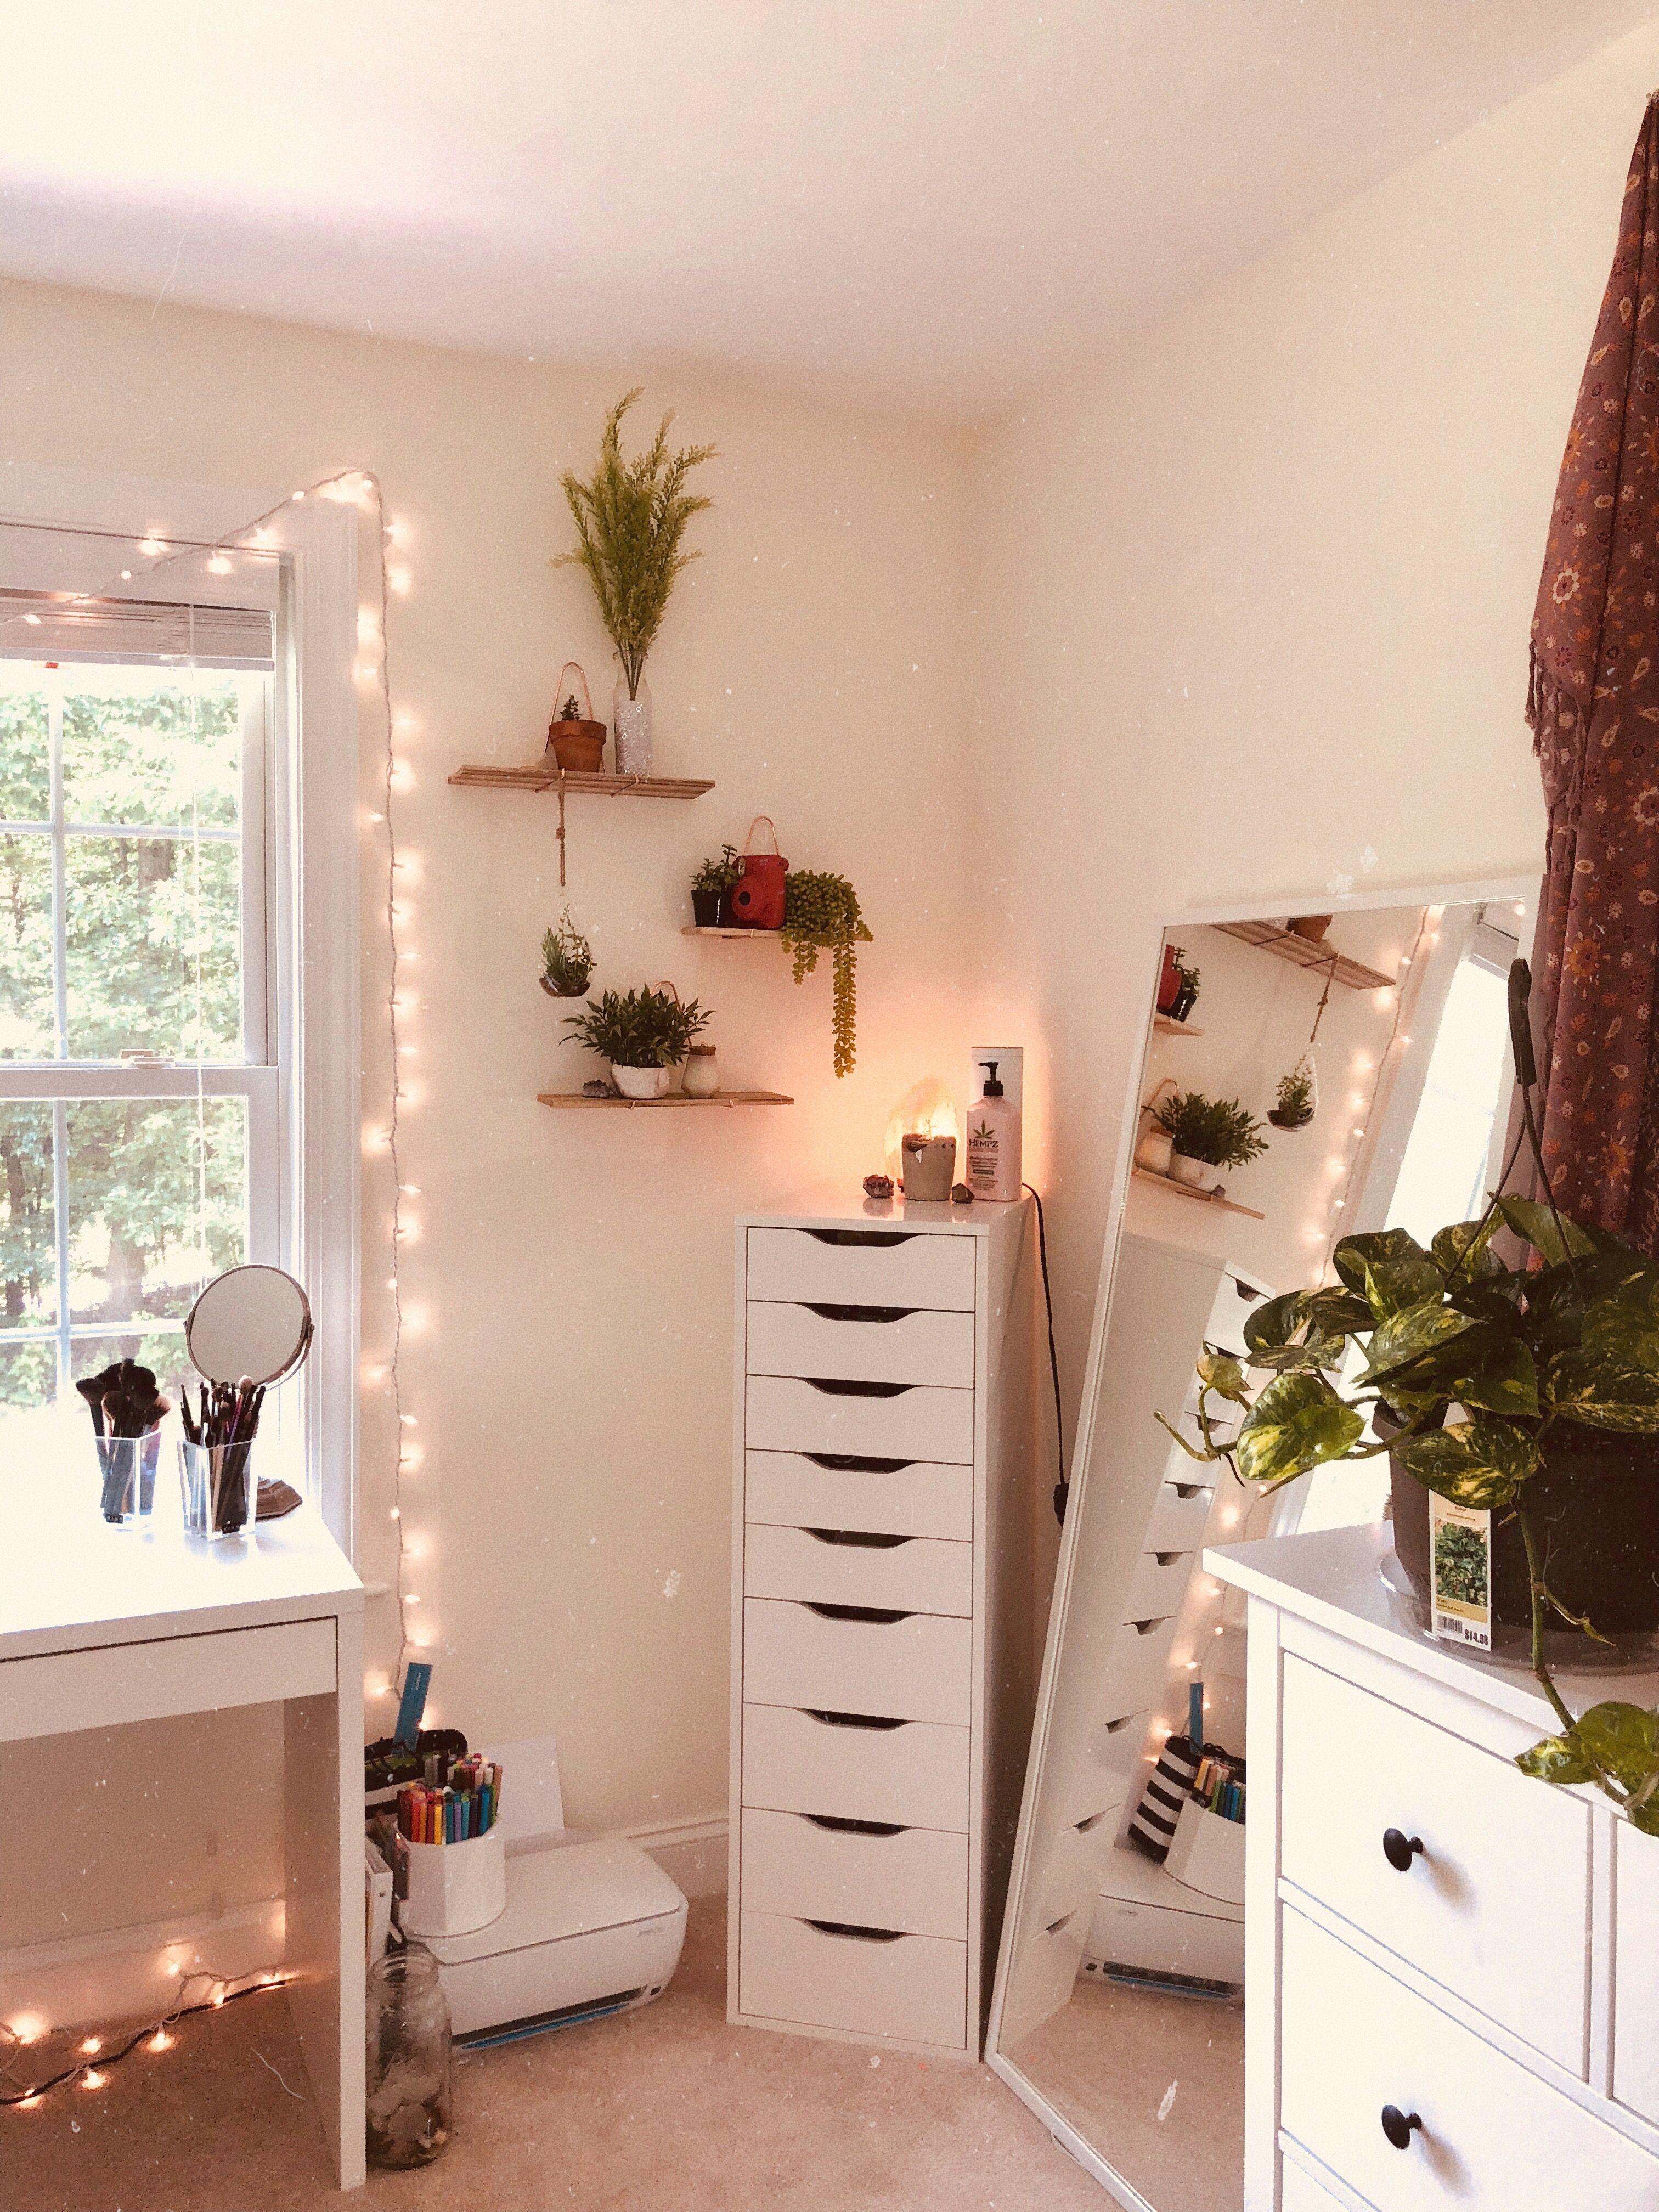 white walls fairy lights green plants tapestry bedroom decor ideas